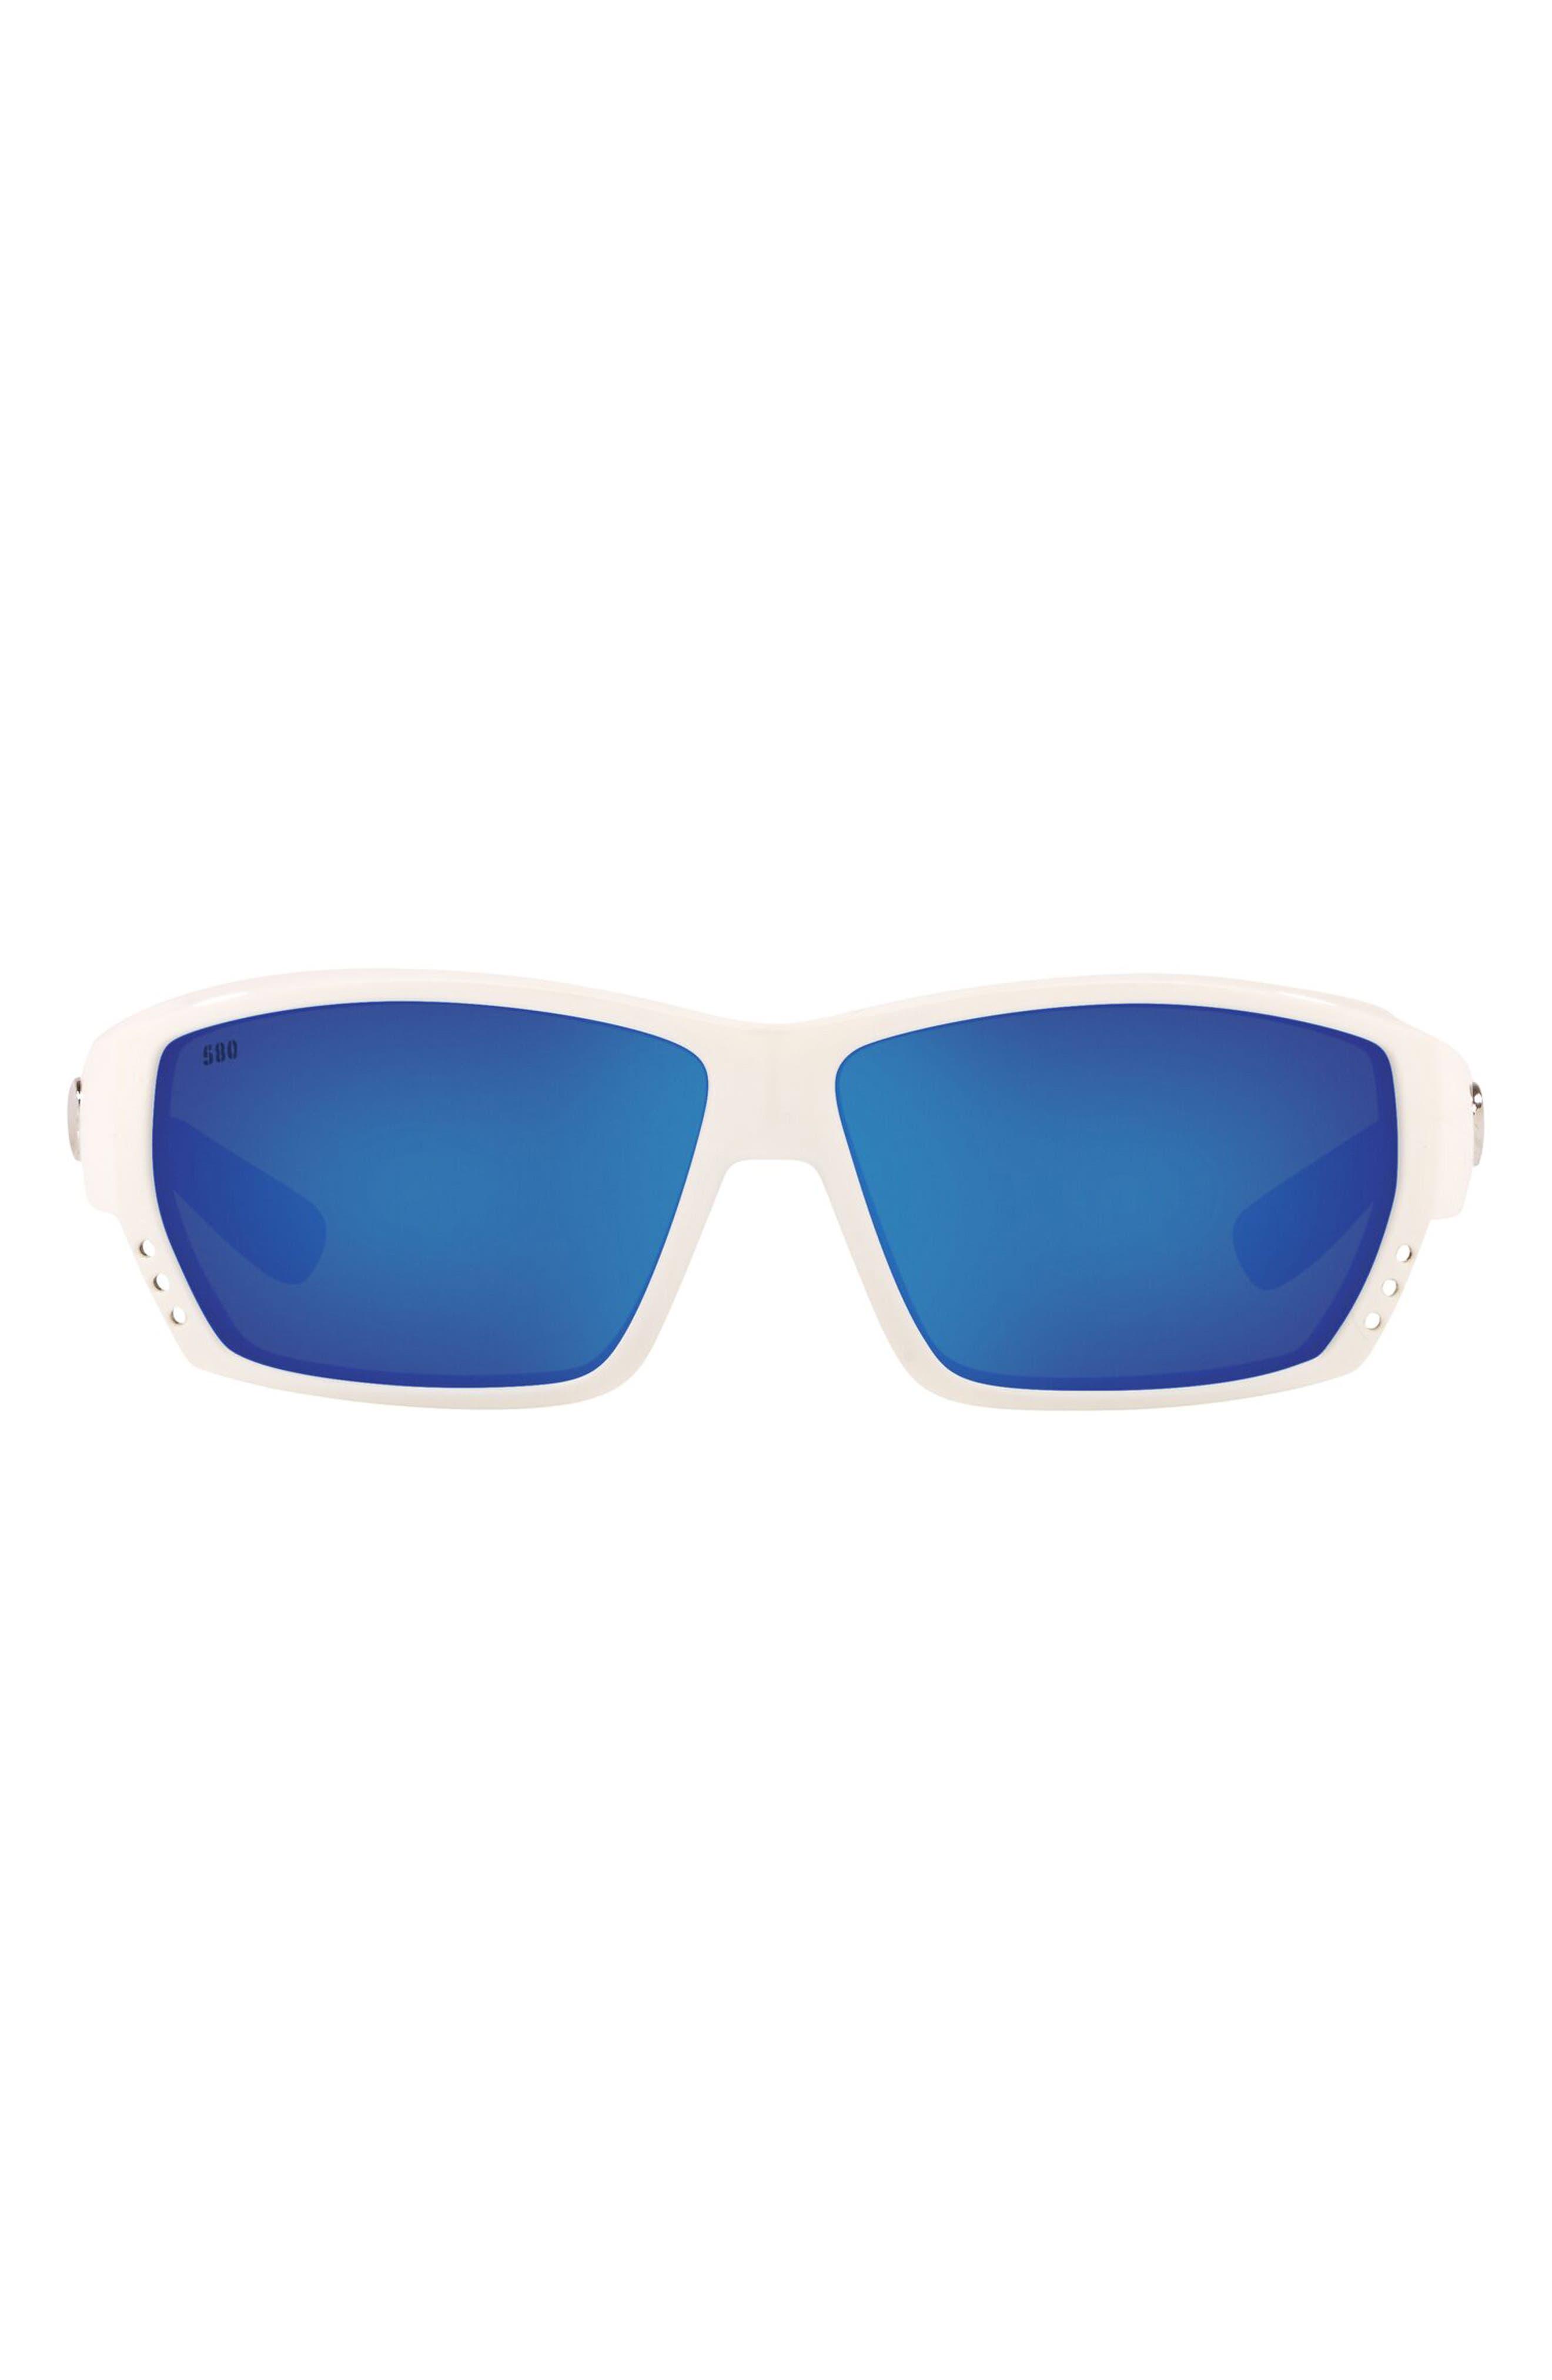 62mm Polarized Wraparound Sunglasses